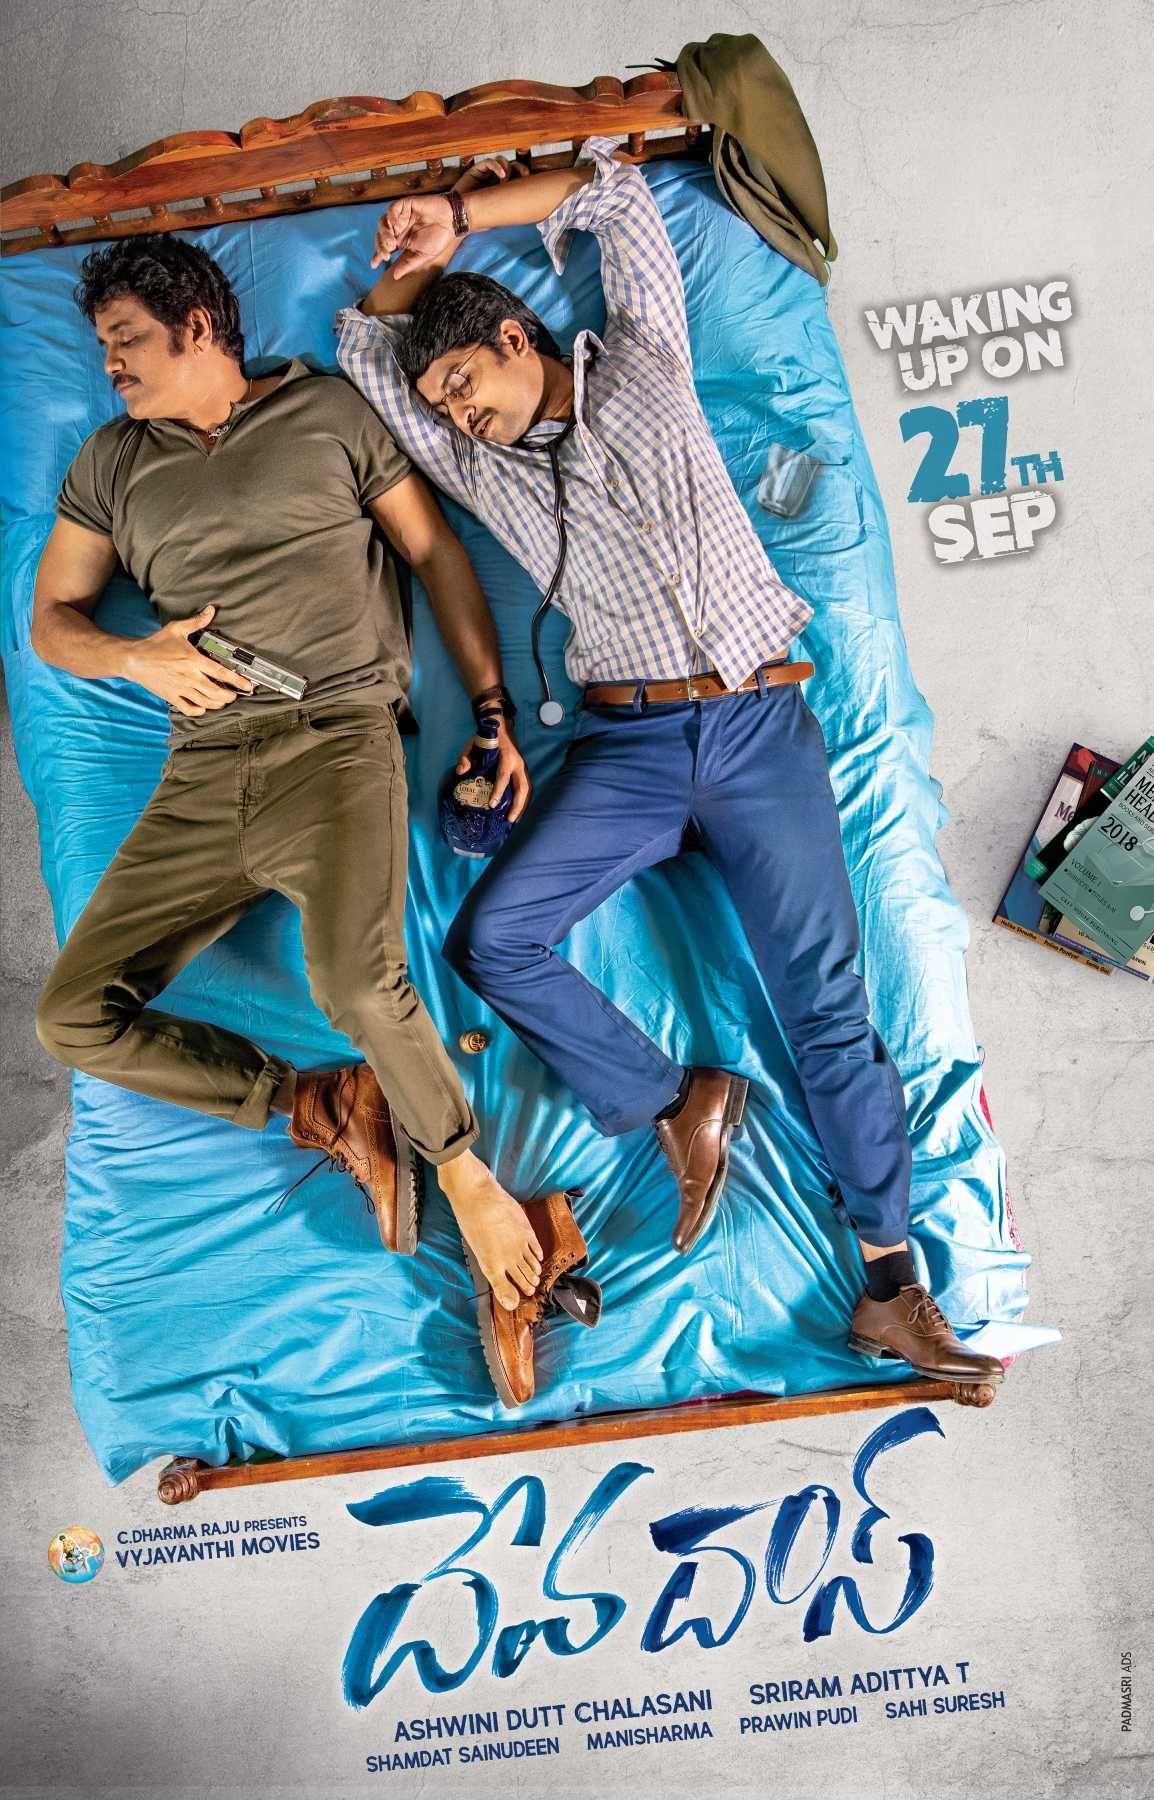 Nani, Nagarjuna Devadas movie satellite rights price